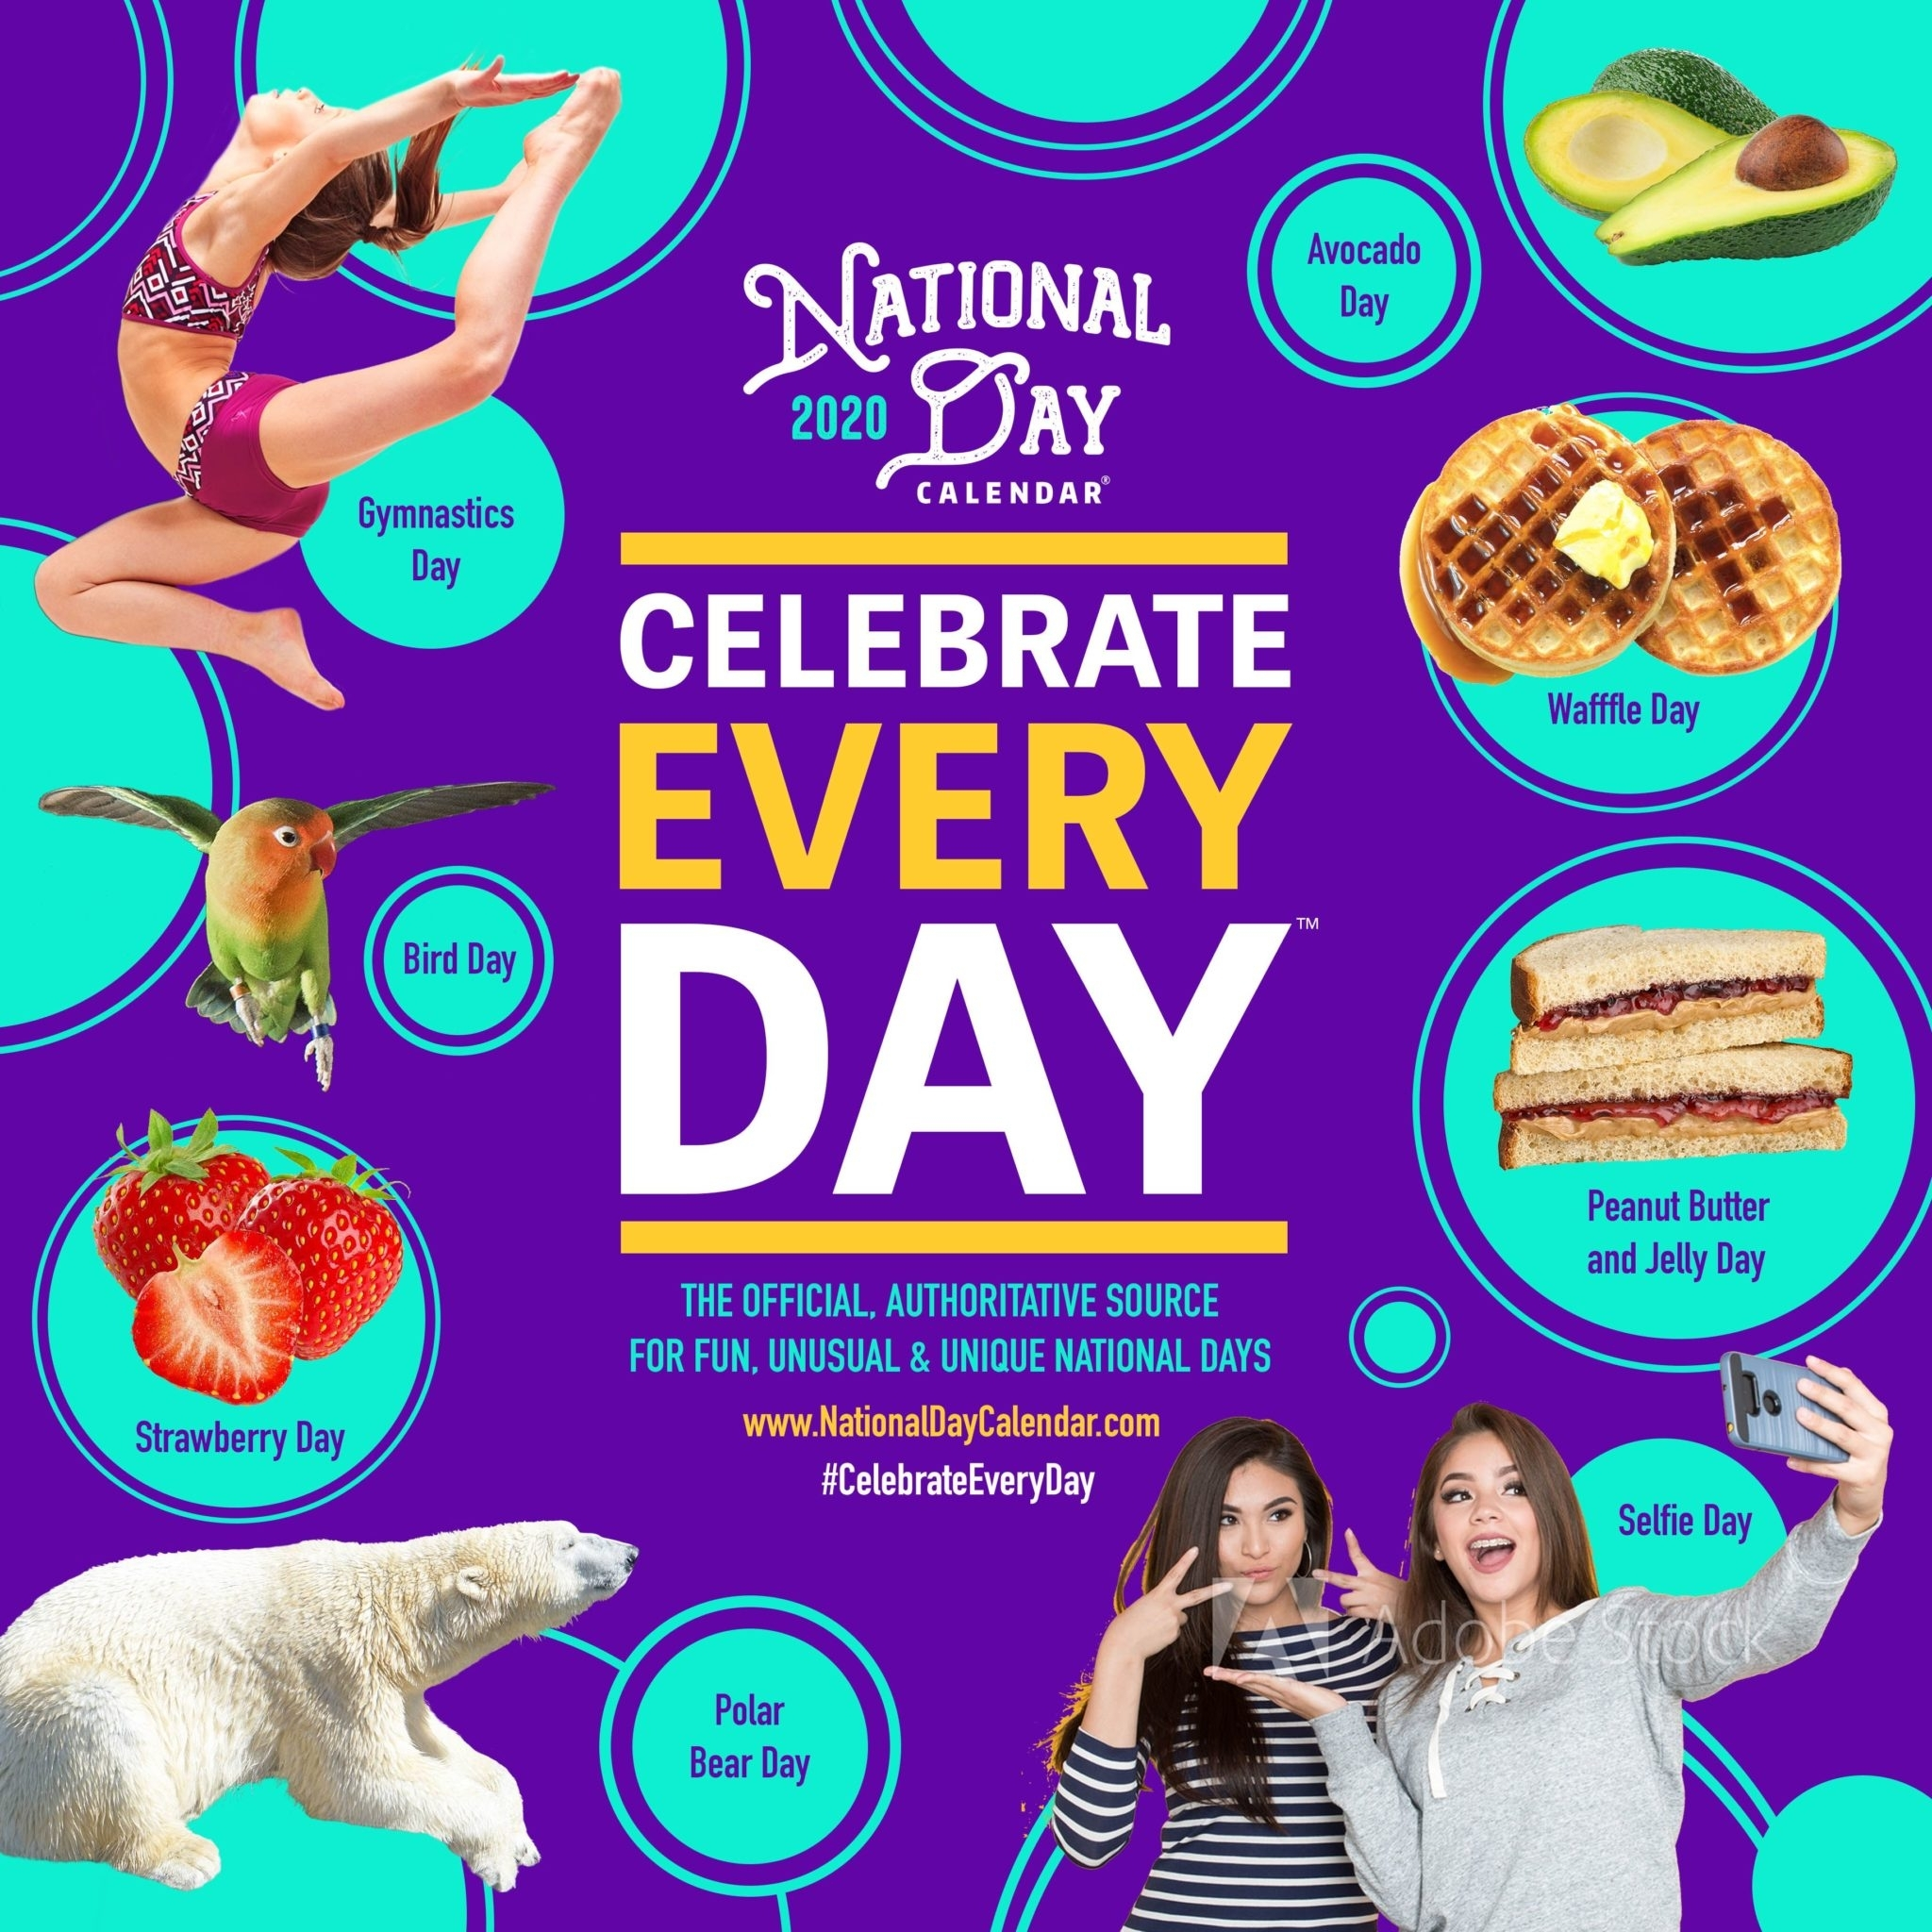 Calendar At A Glance - National Day Calendar in National Day Calendar 2020 Printable